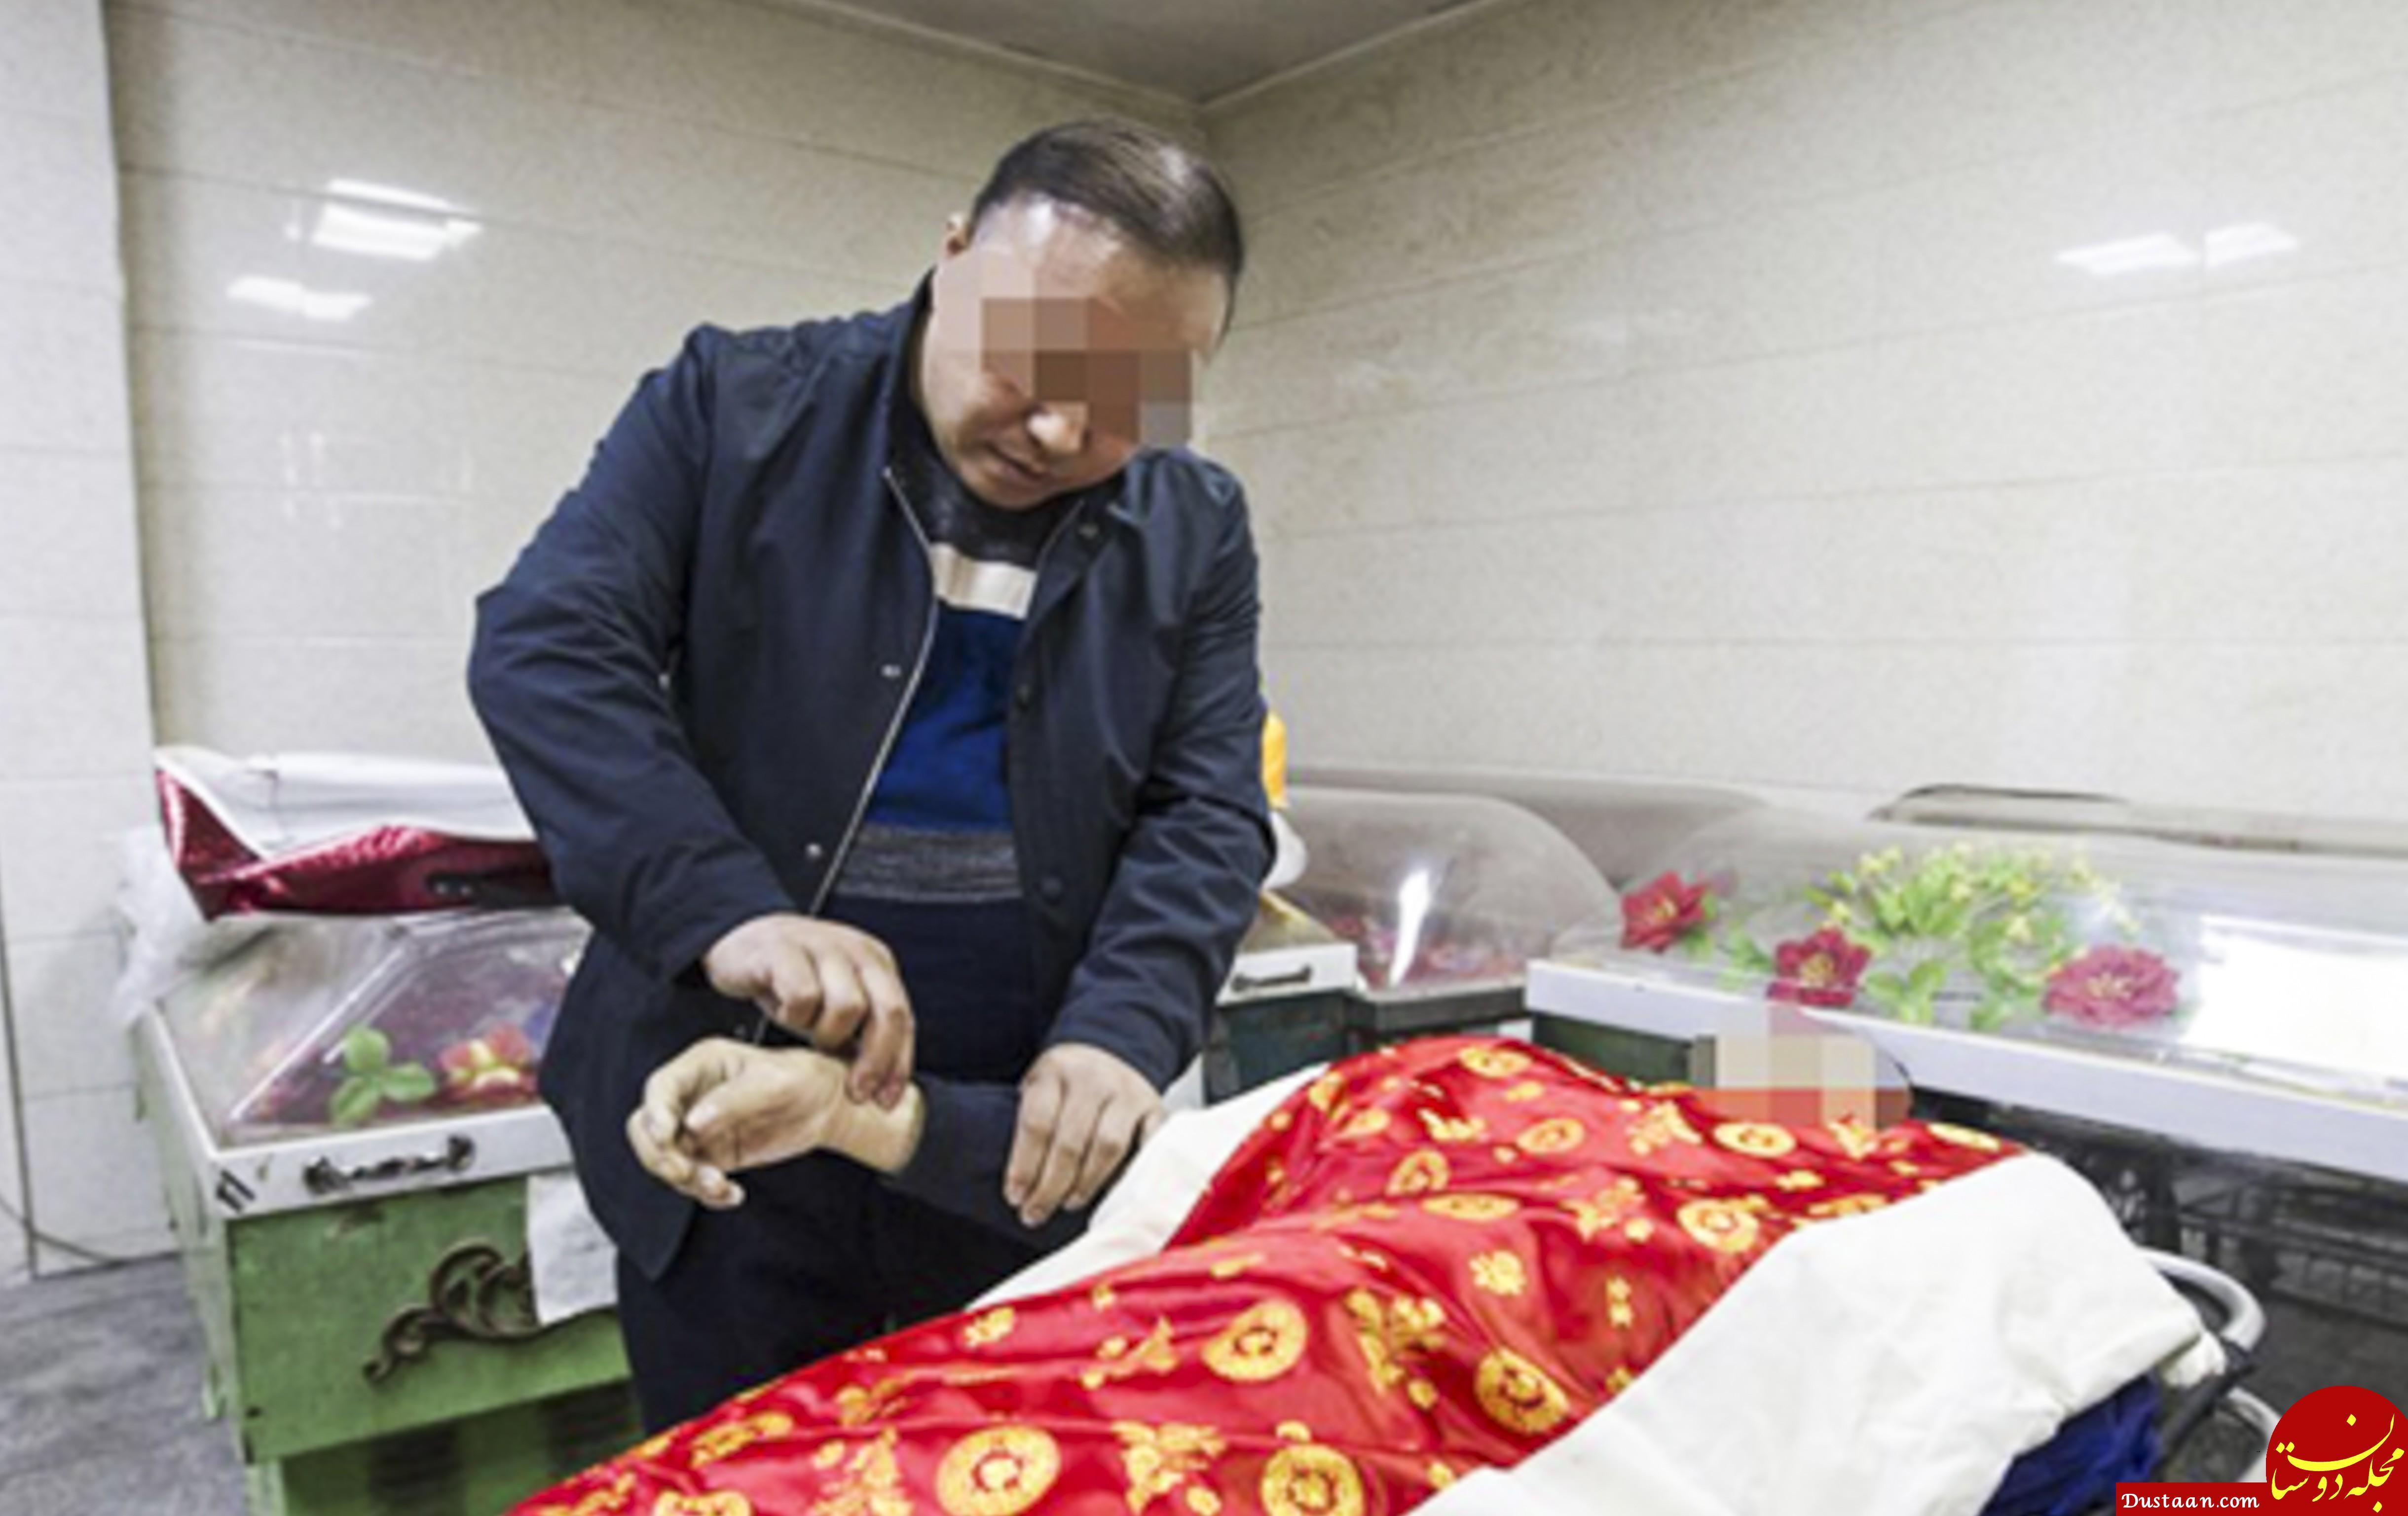 www.dustaan.com زنی که شوهر خود را زنده زنده راهی سردخانه کرد! +عکس